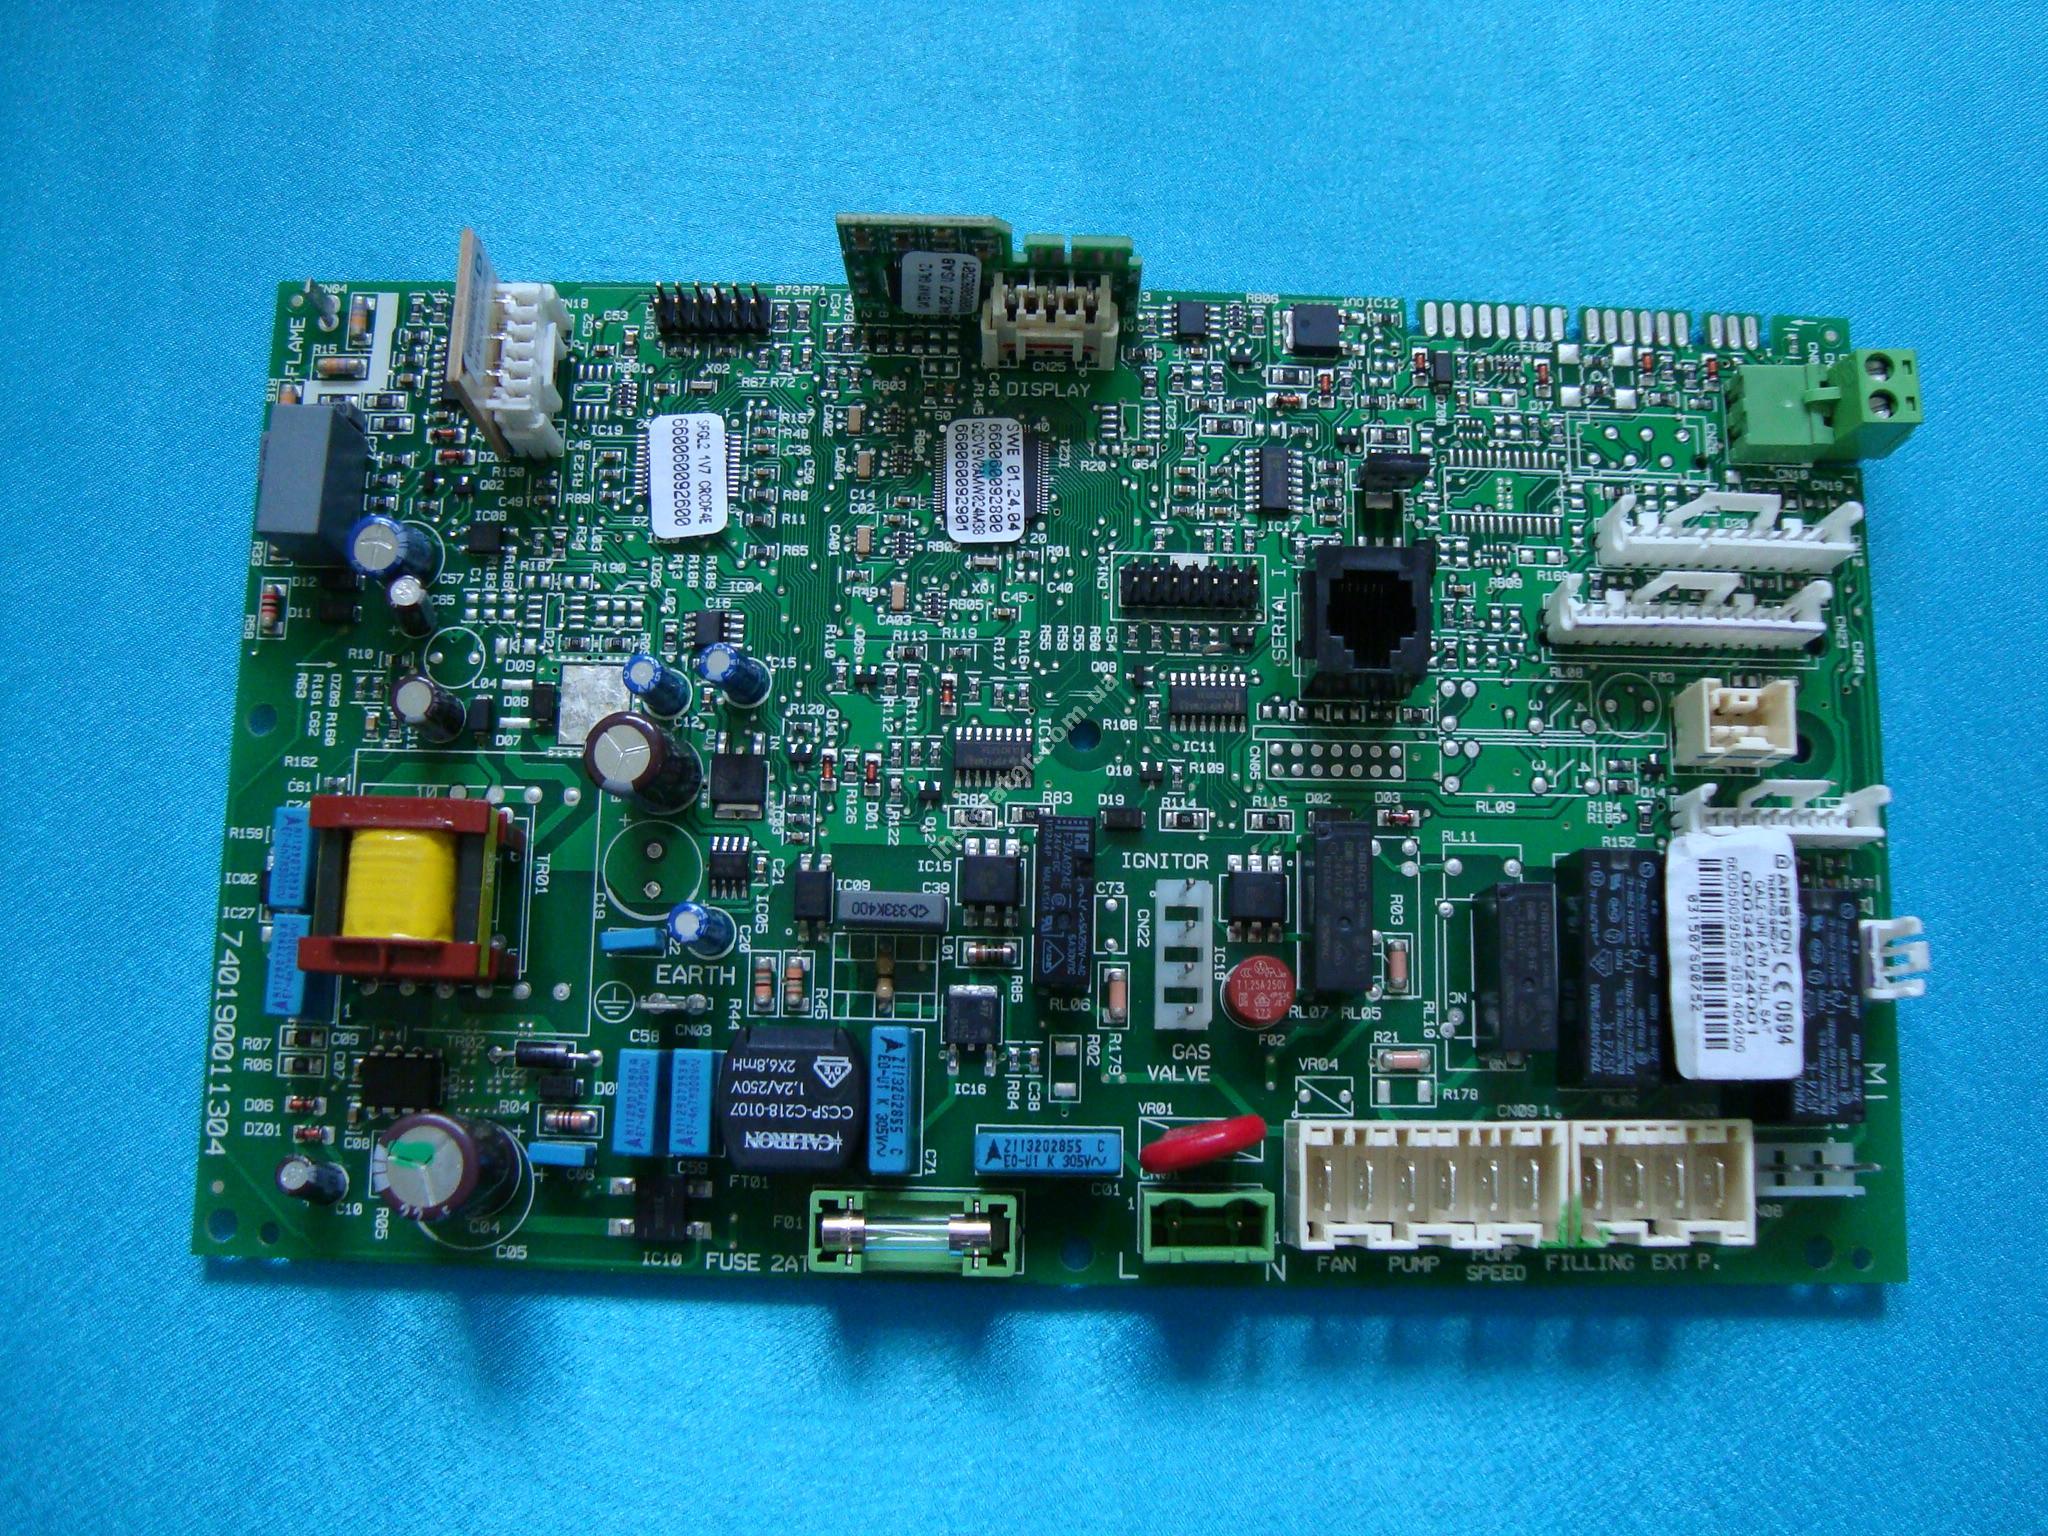 65109313-04 Плата керування універсальна ARISTON/CHAFFOTEAUX